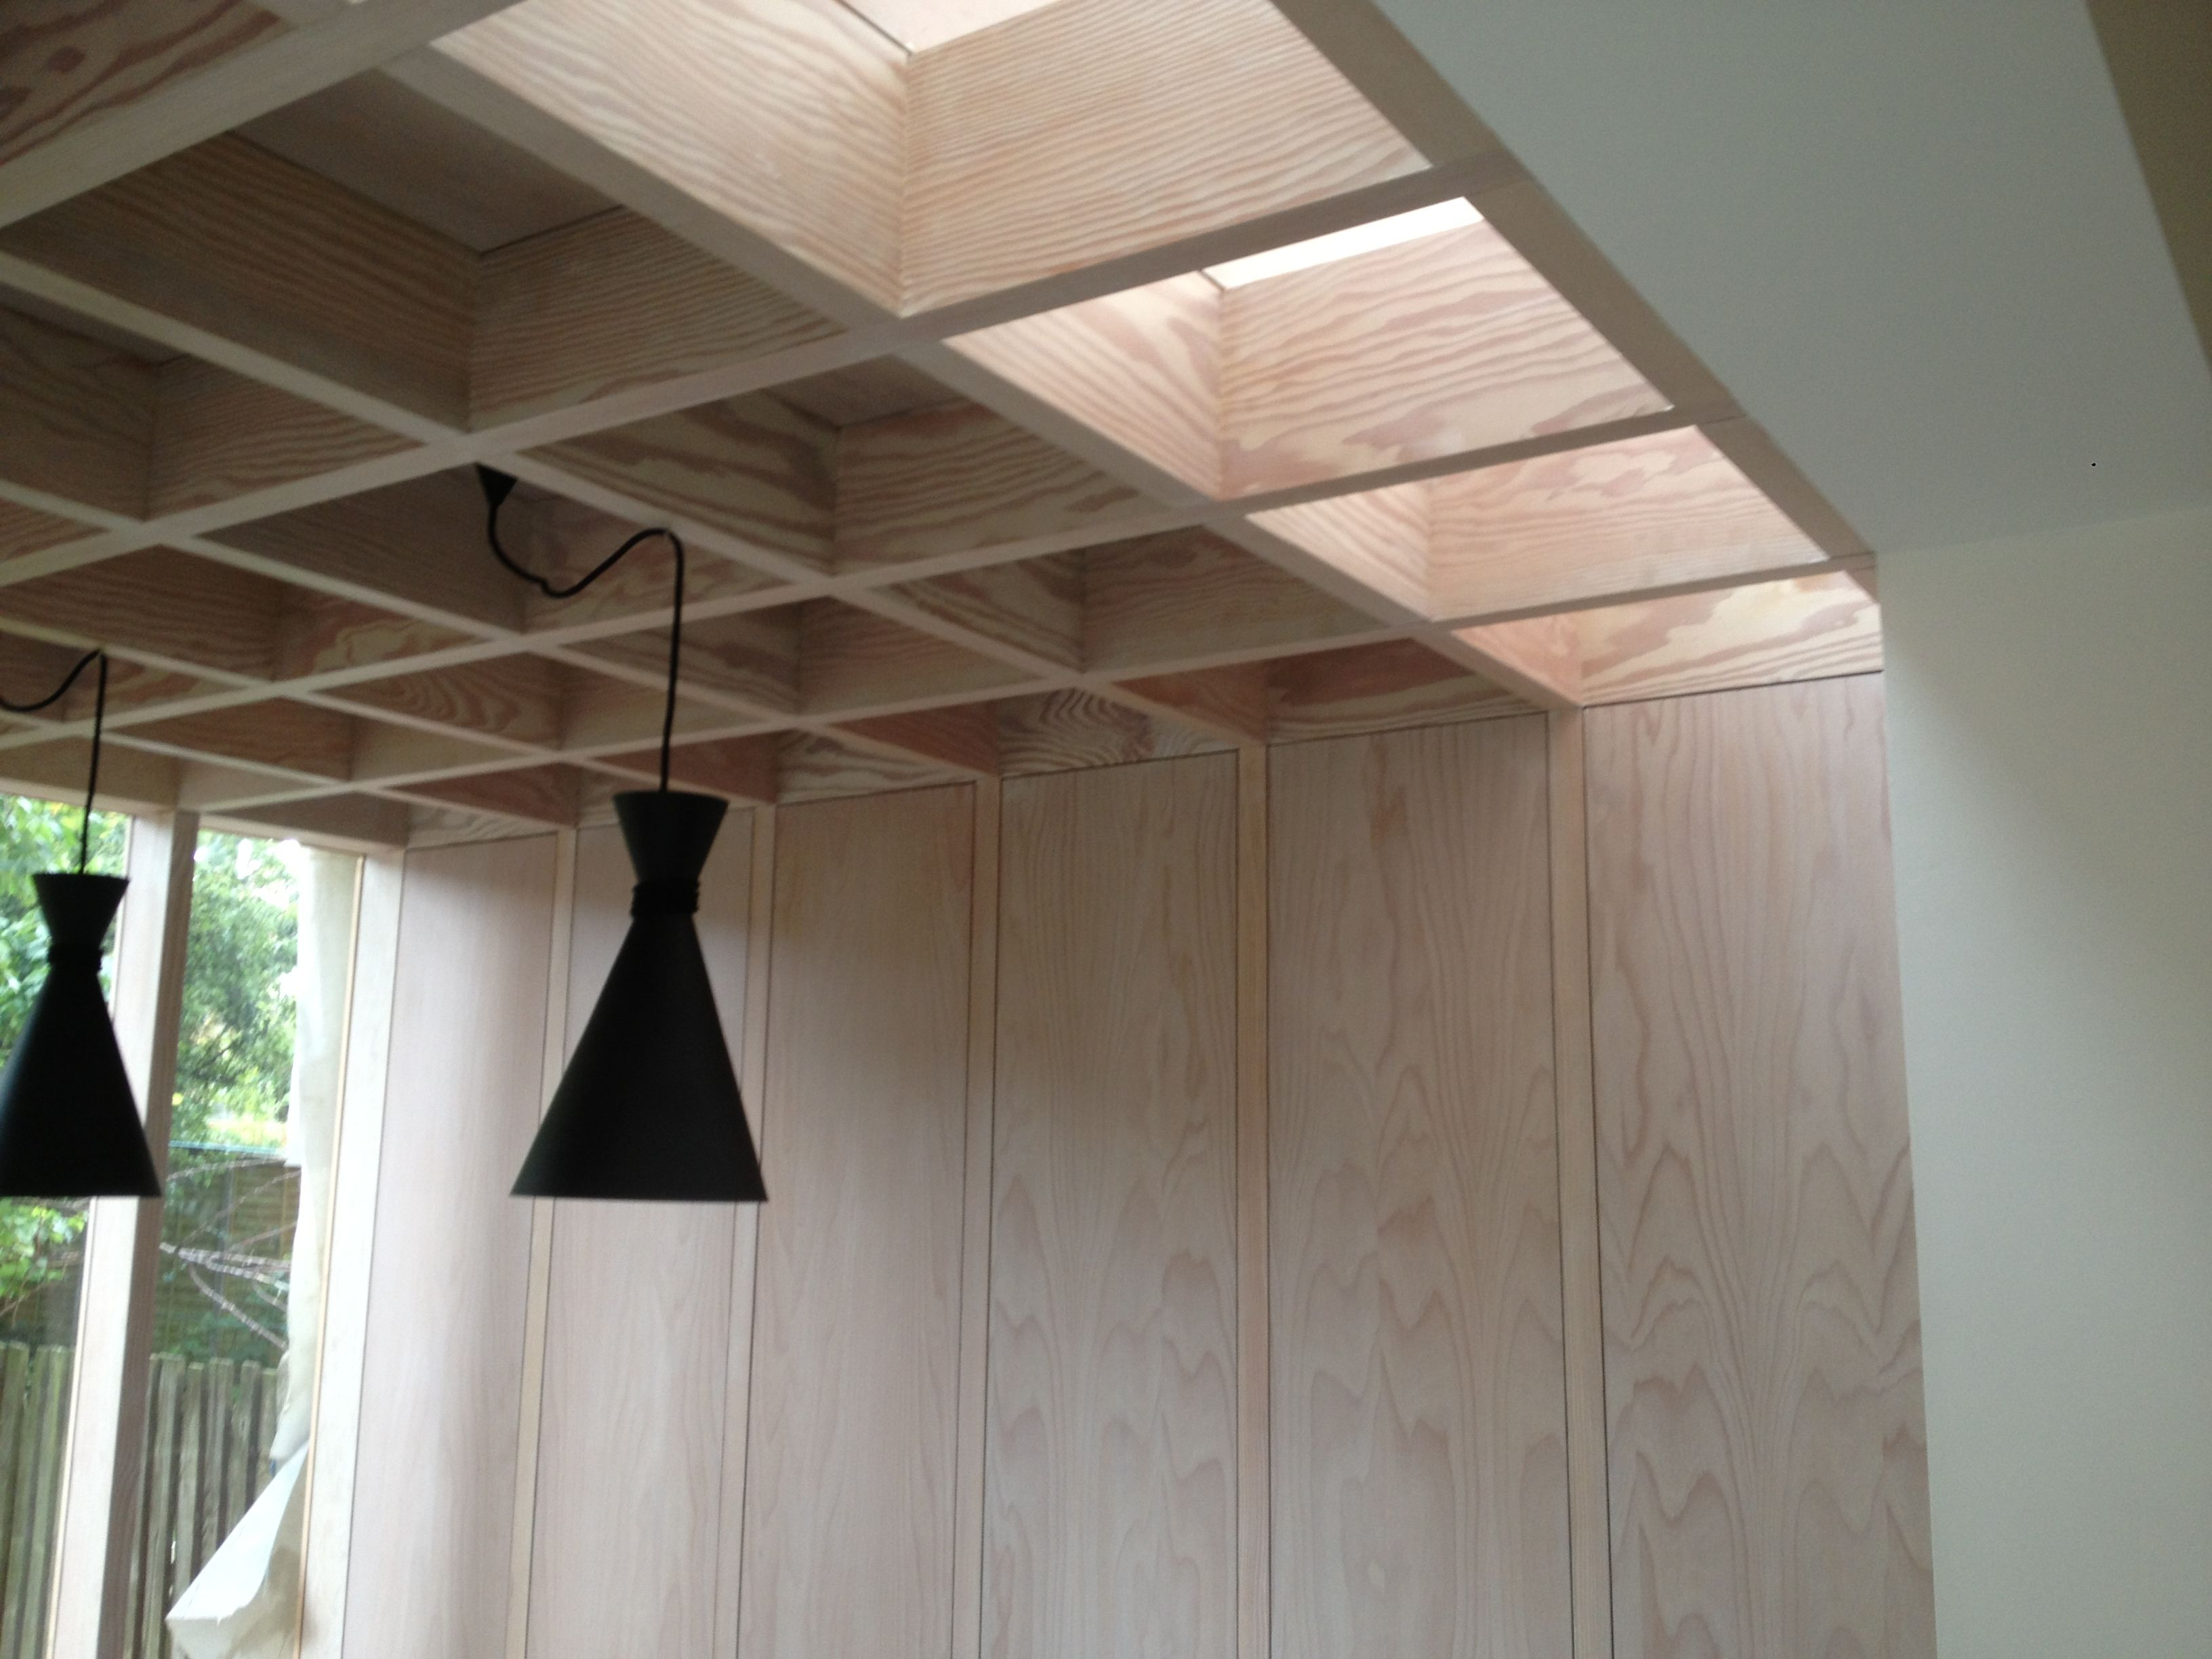 Doyle Gardens Kensal Rise Lioneye Properties Interior Architecture Eco House Wood Wax